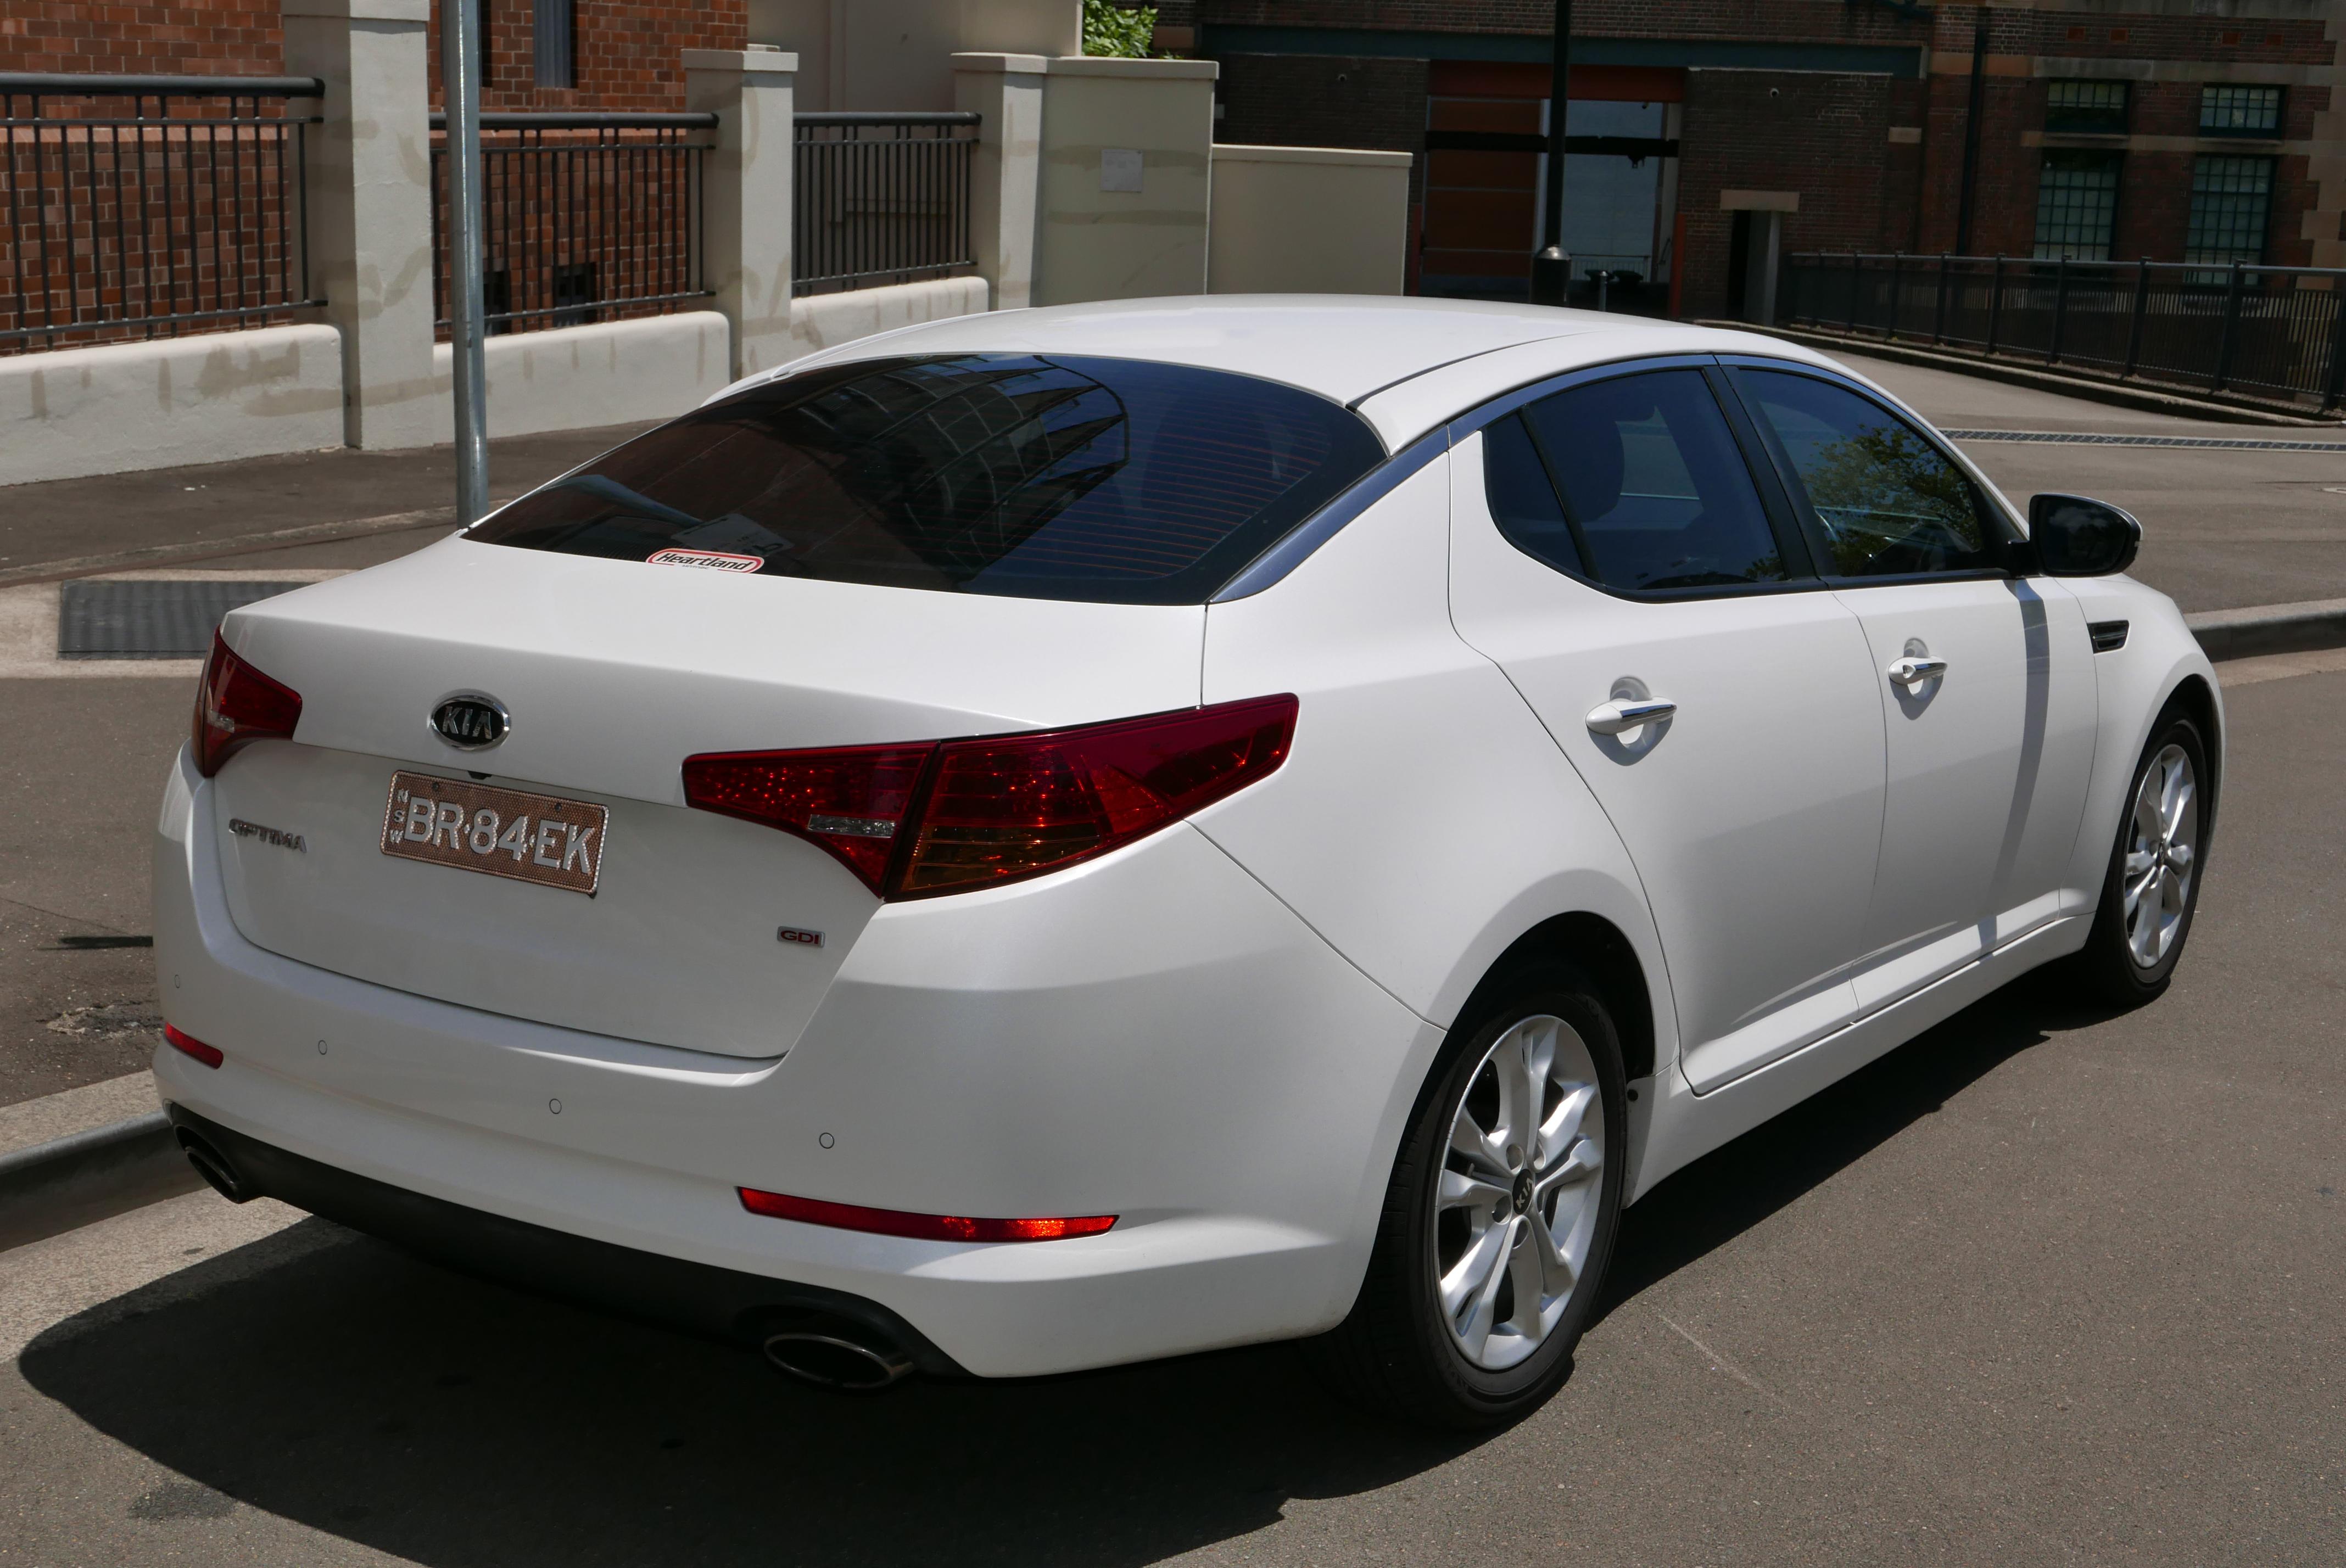 news information com optima image sedan and conceptcarz kia